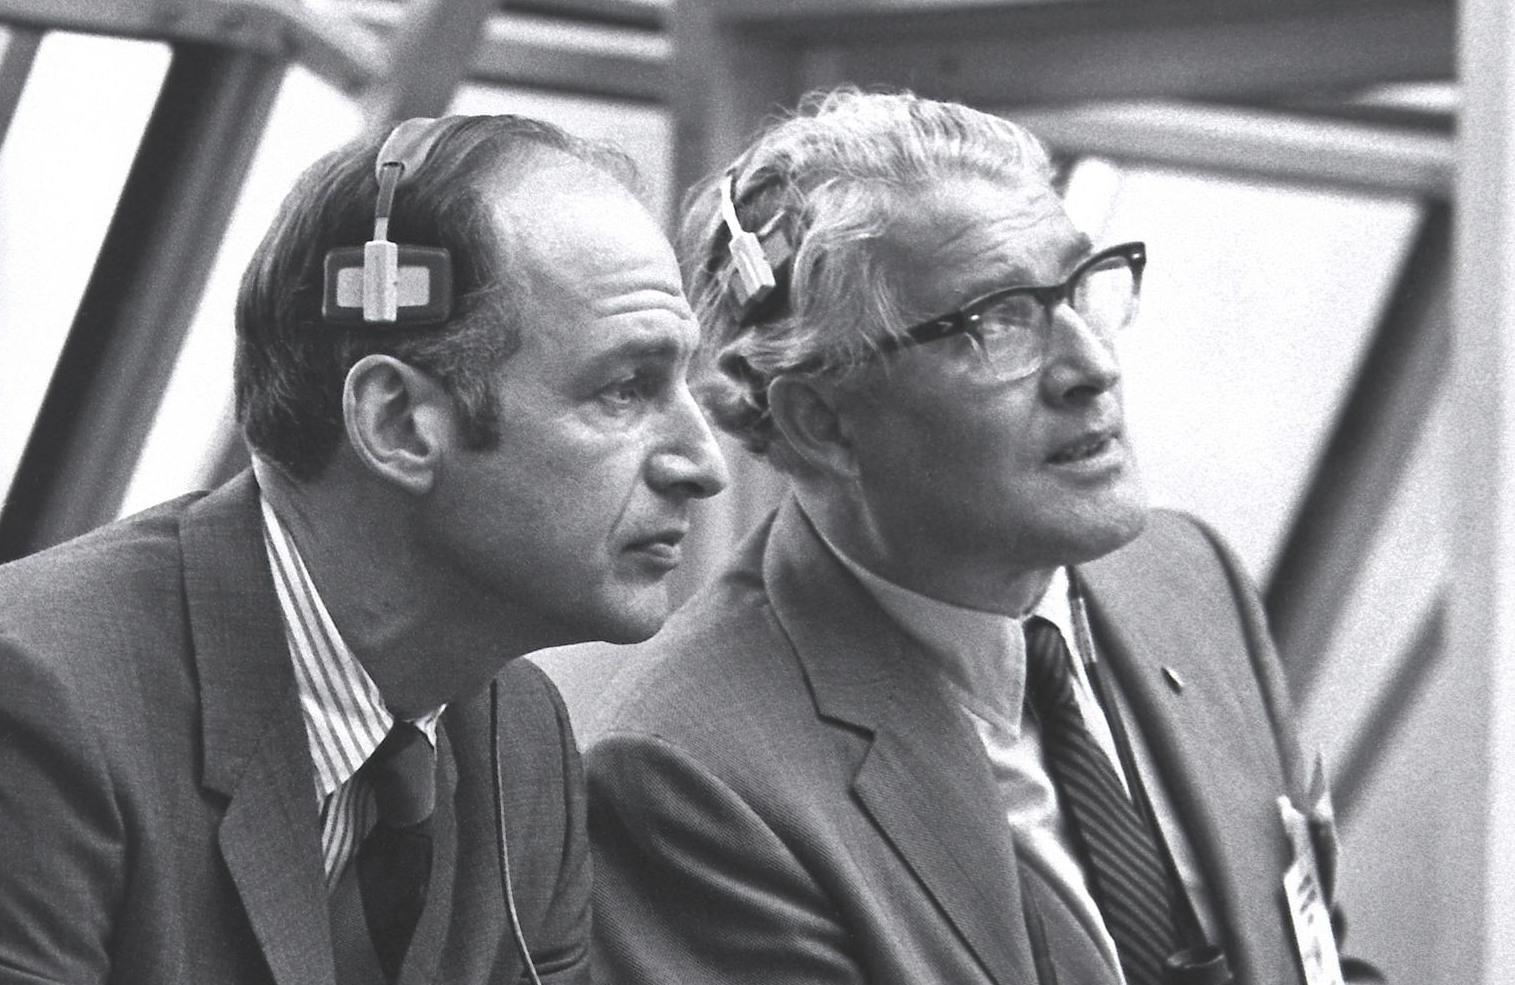 The Apollo capsule program manager, George M. Low, left, and rocket designer Wernher von Braun.